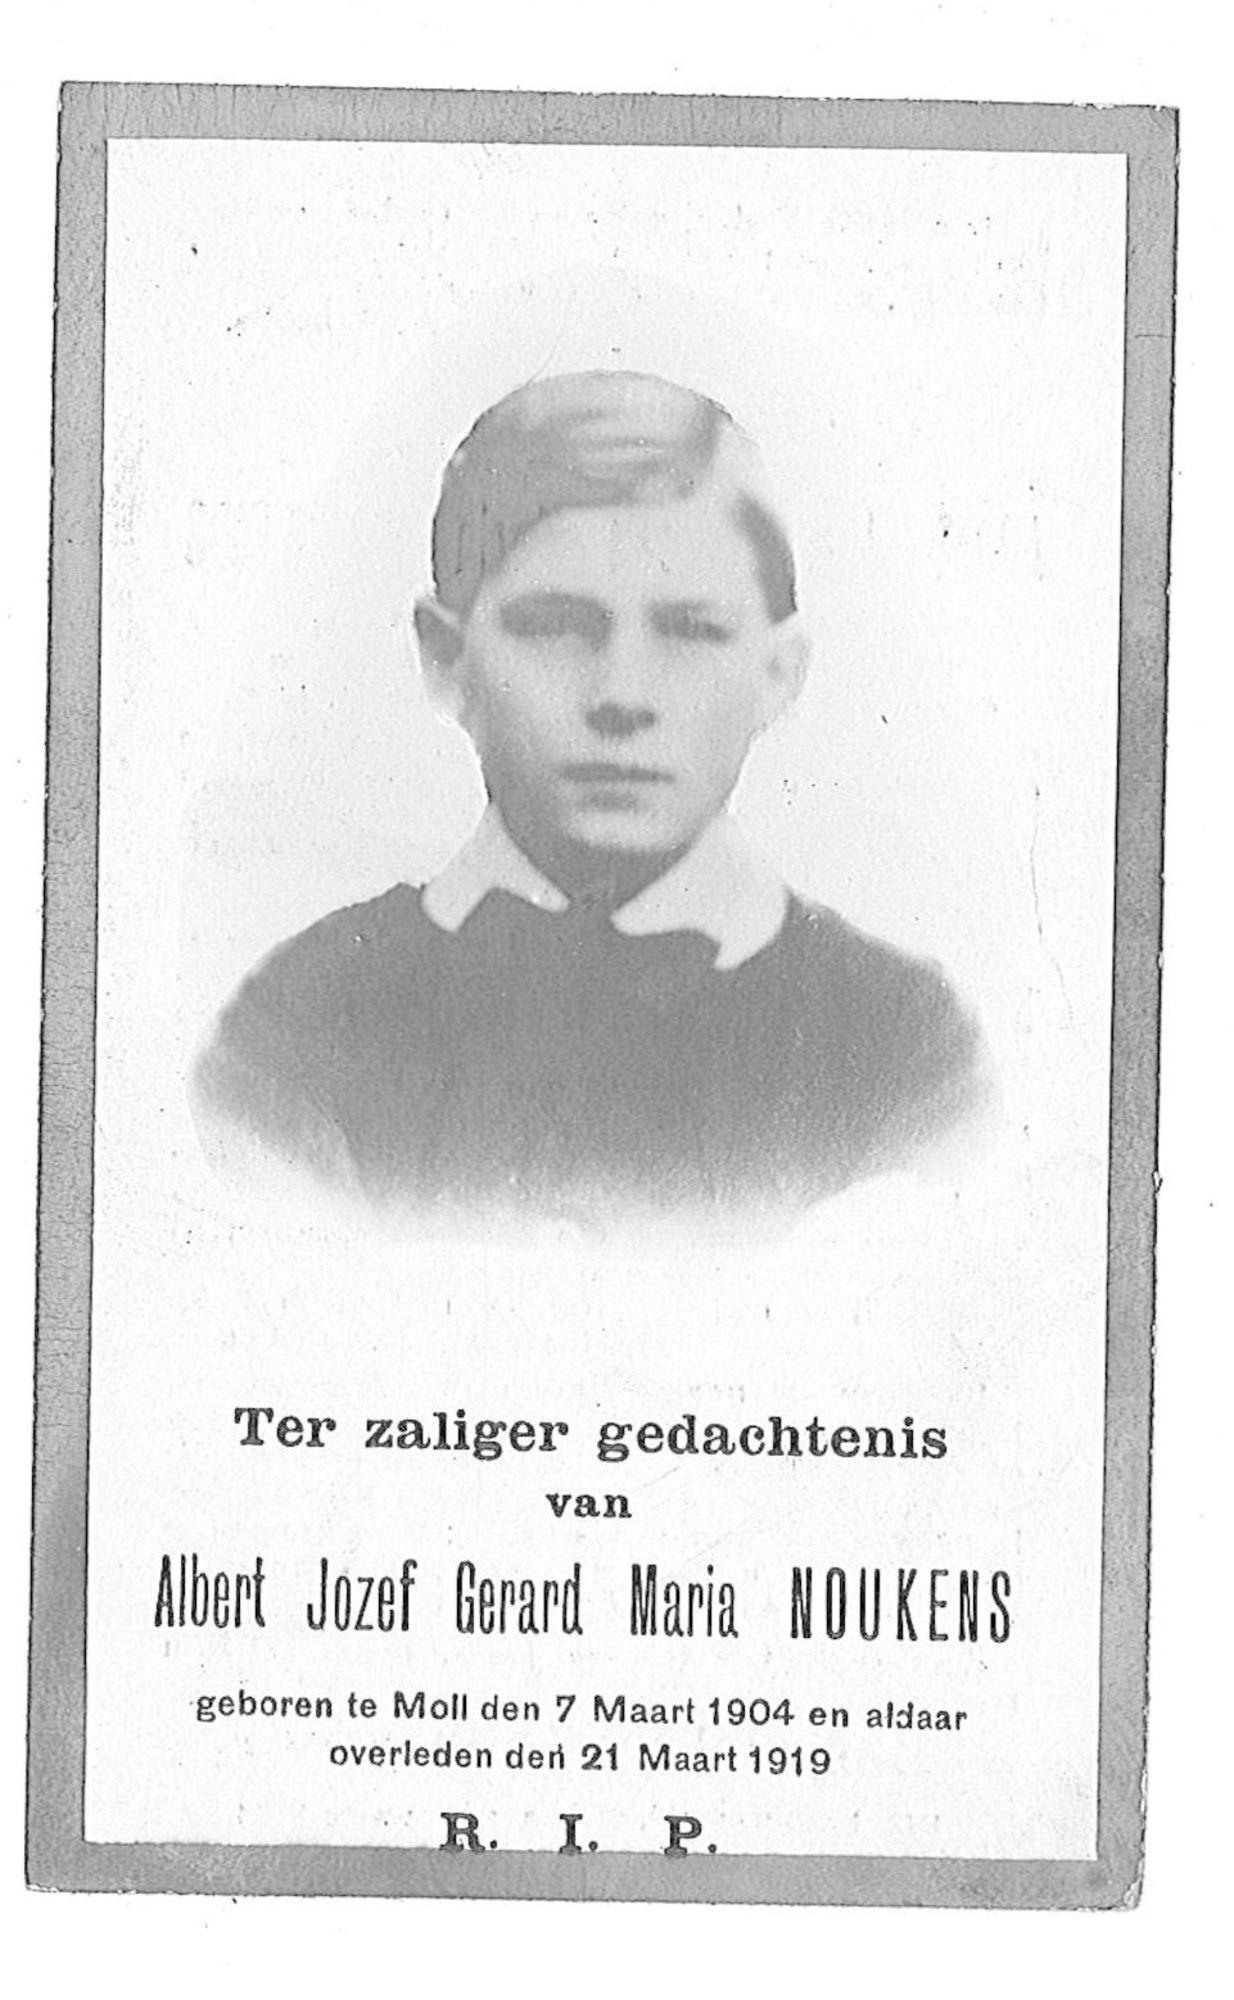 Albert-Jozef-Gerard-Maria Noukens